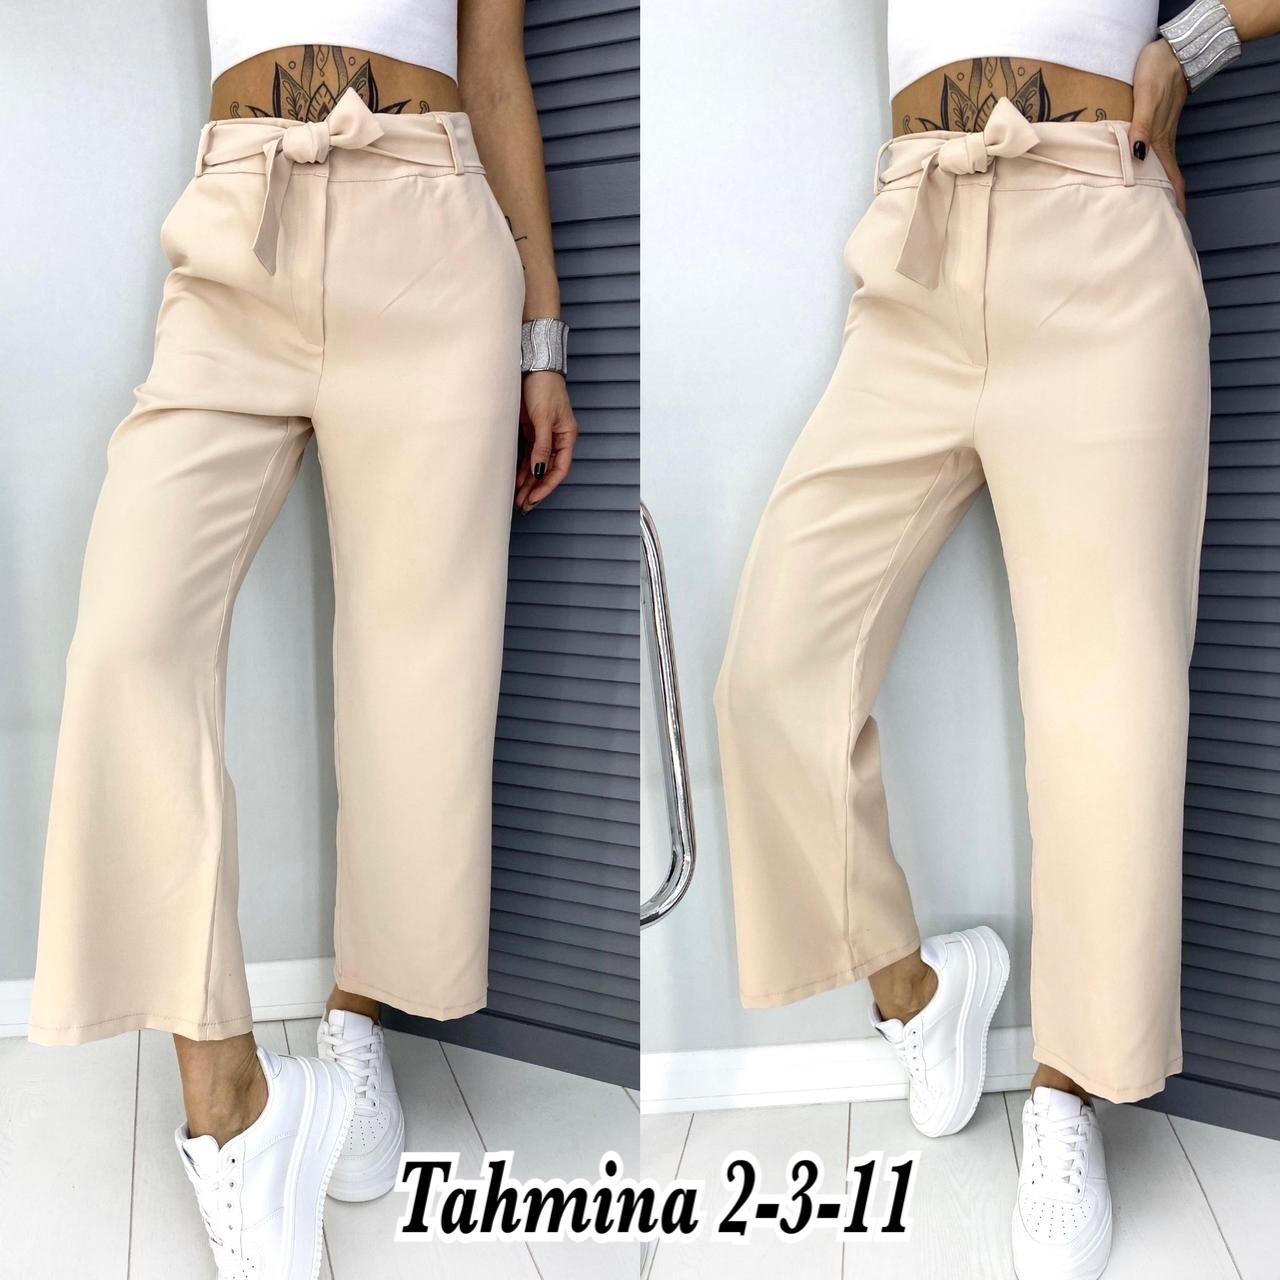 Женские брюки, костюмка класса люкс, р-р 42-44; 44-46 (бежевый)